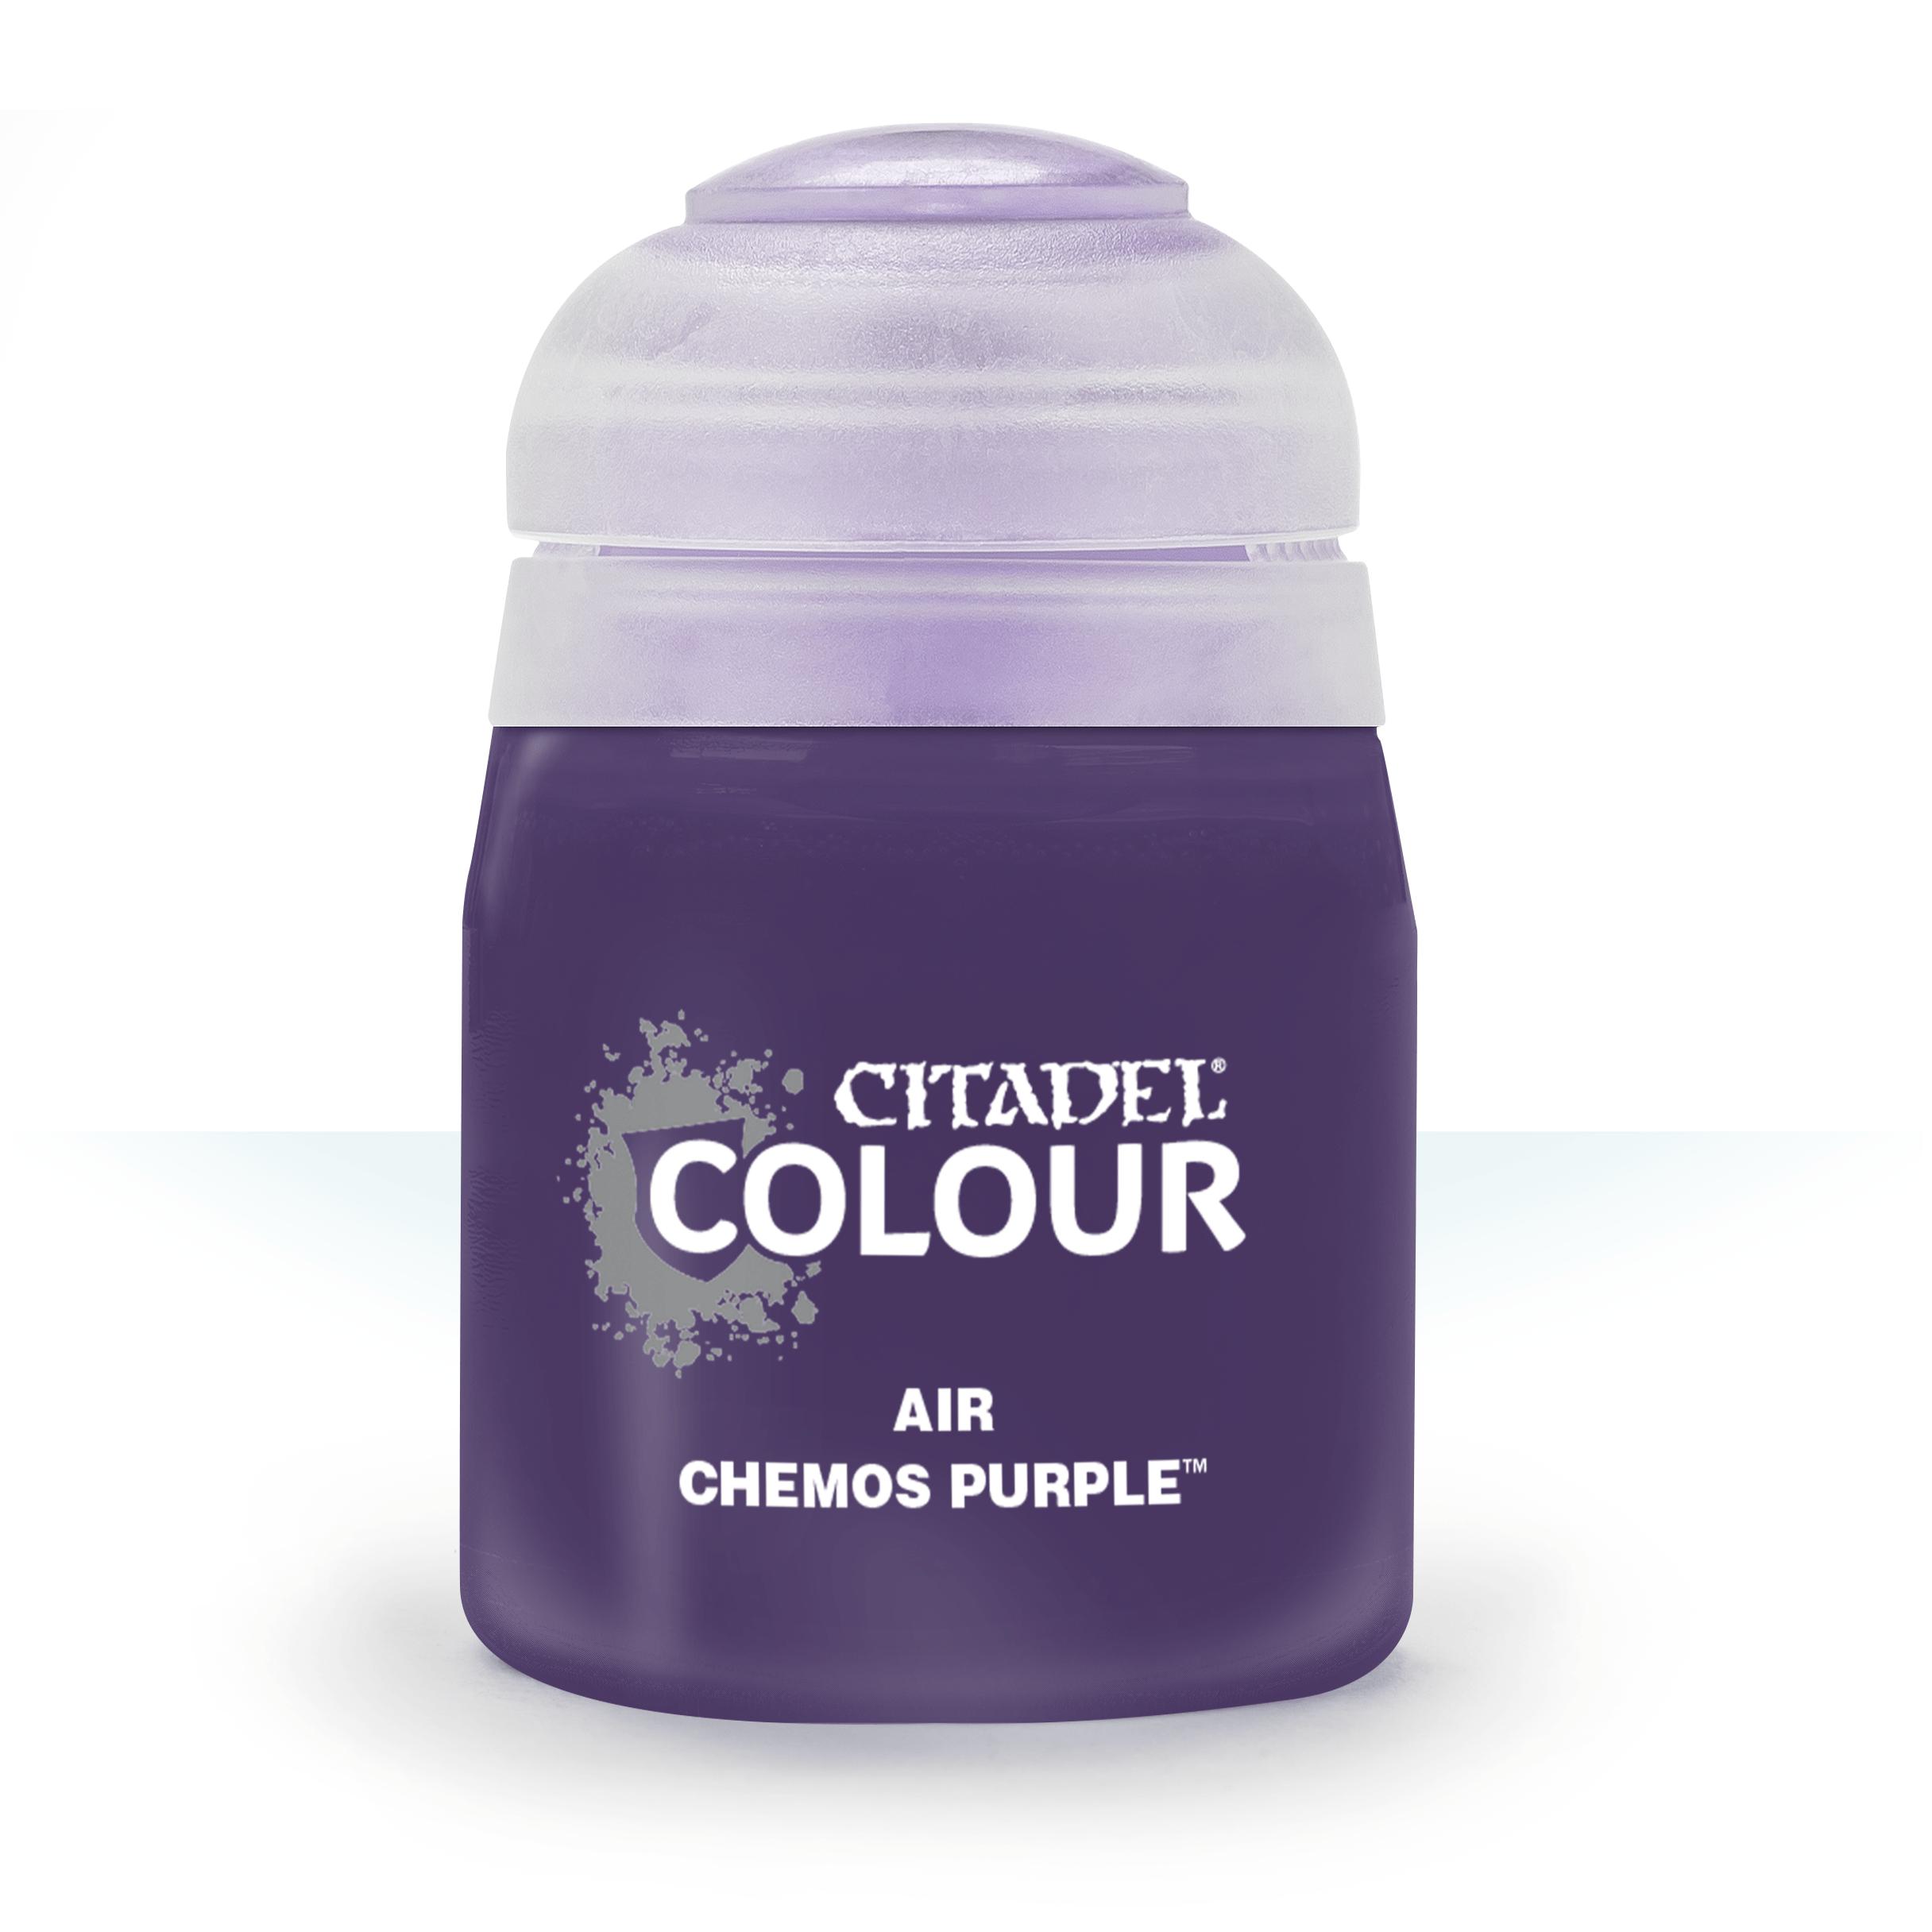 Chemos Purple, Citadel Air 24ml